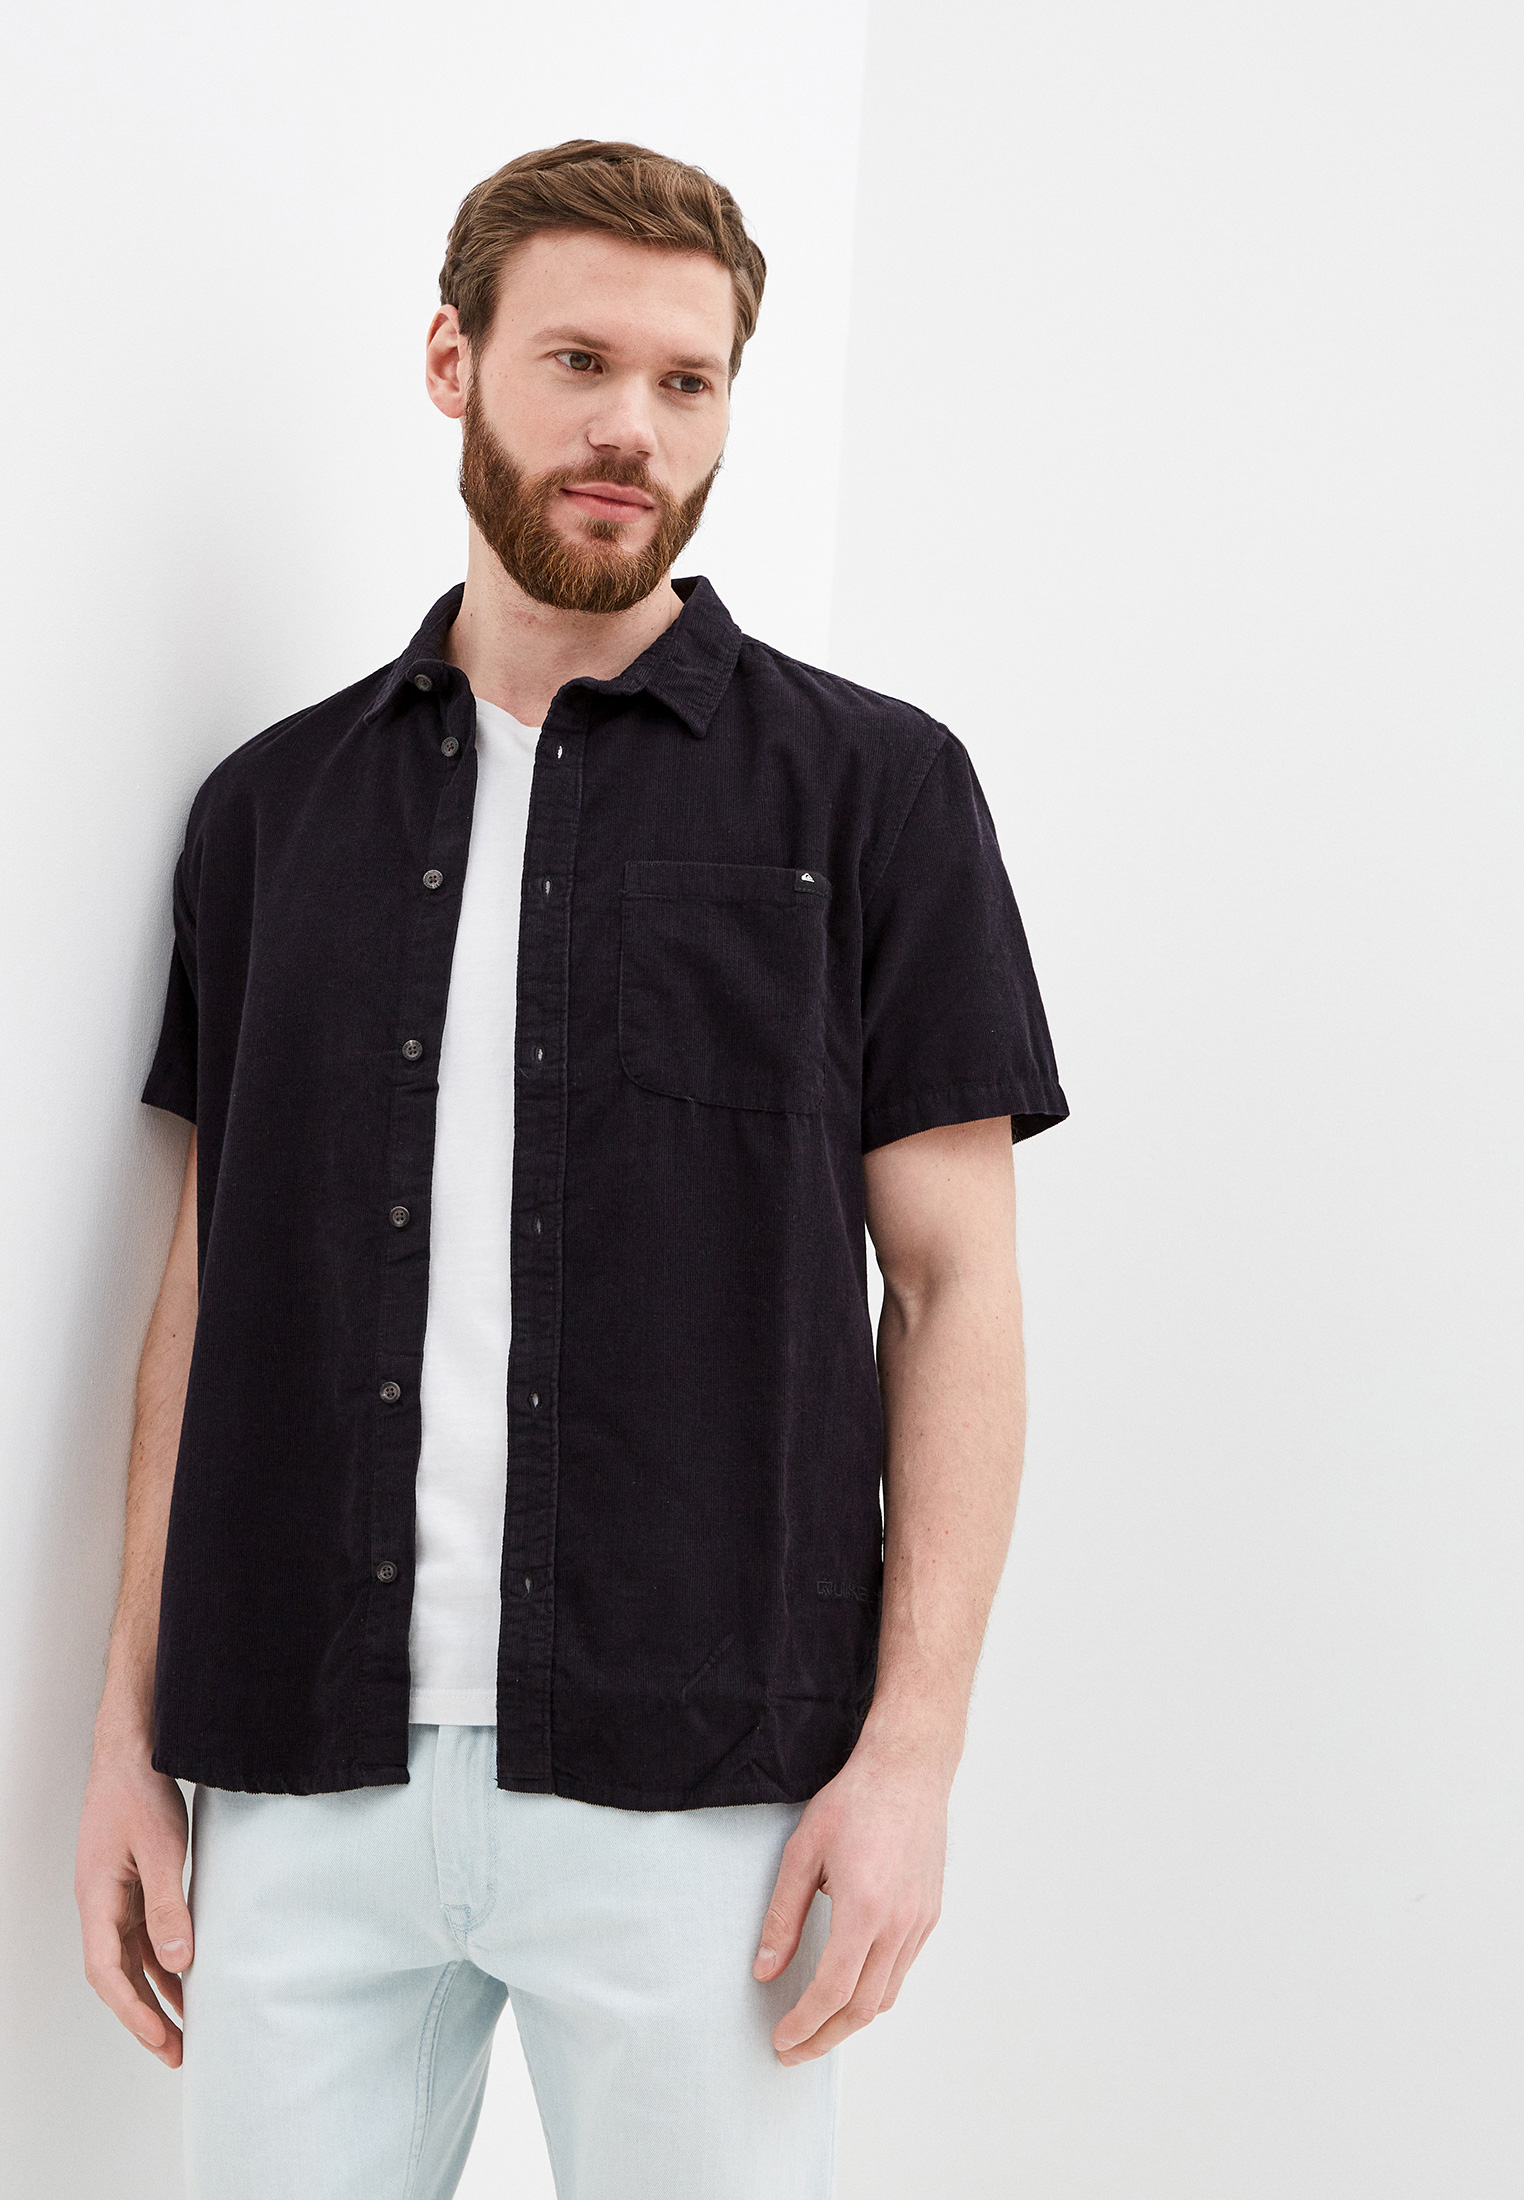 Рубашка с длинным рукавом Quiksilver (Квиксильвер) EQYWT04004